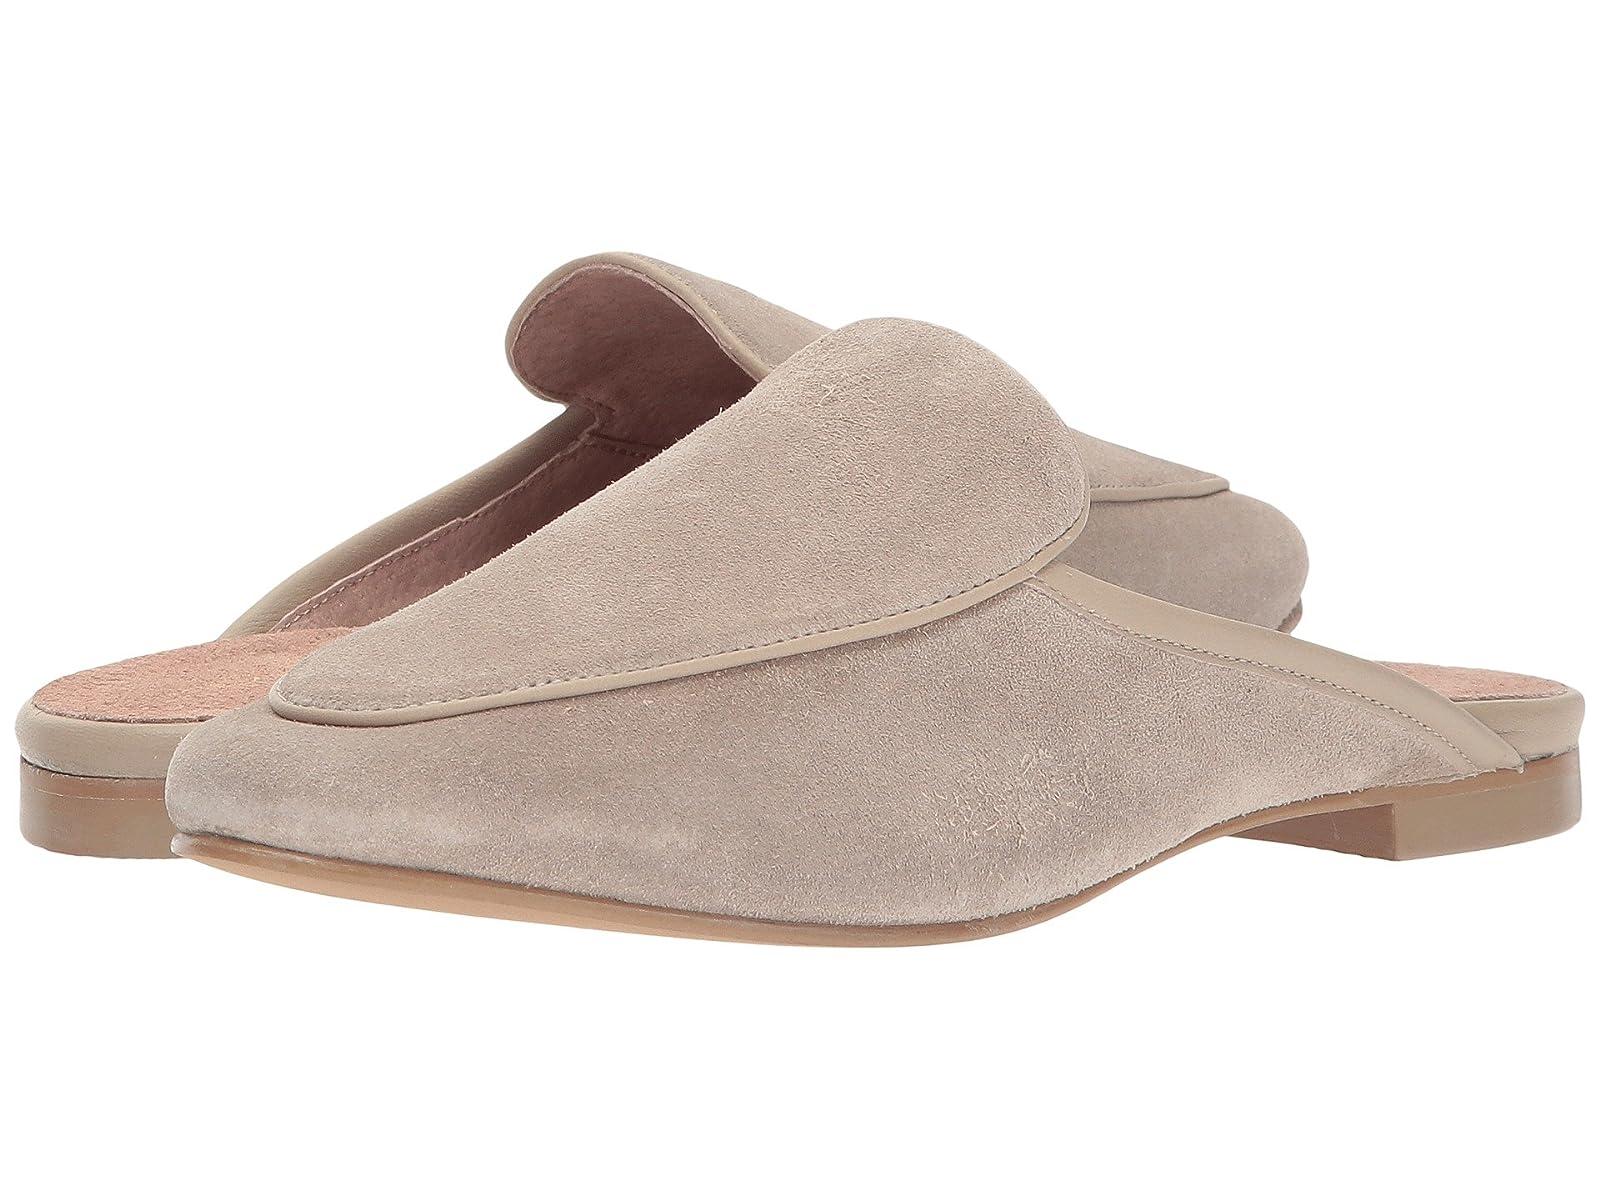 Seychelles WildernessCheap and distinctive eye-catching shoes